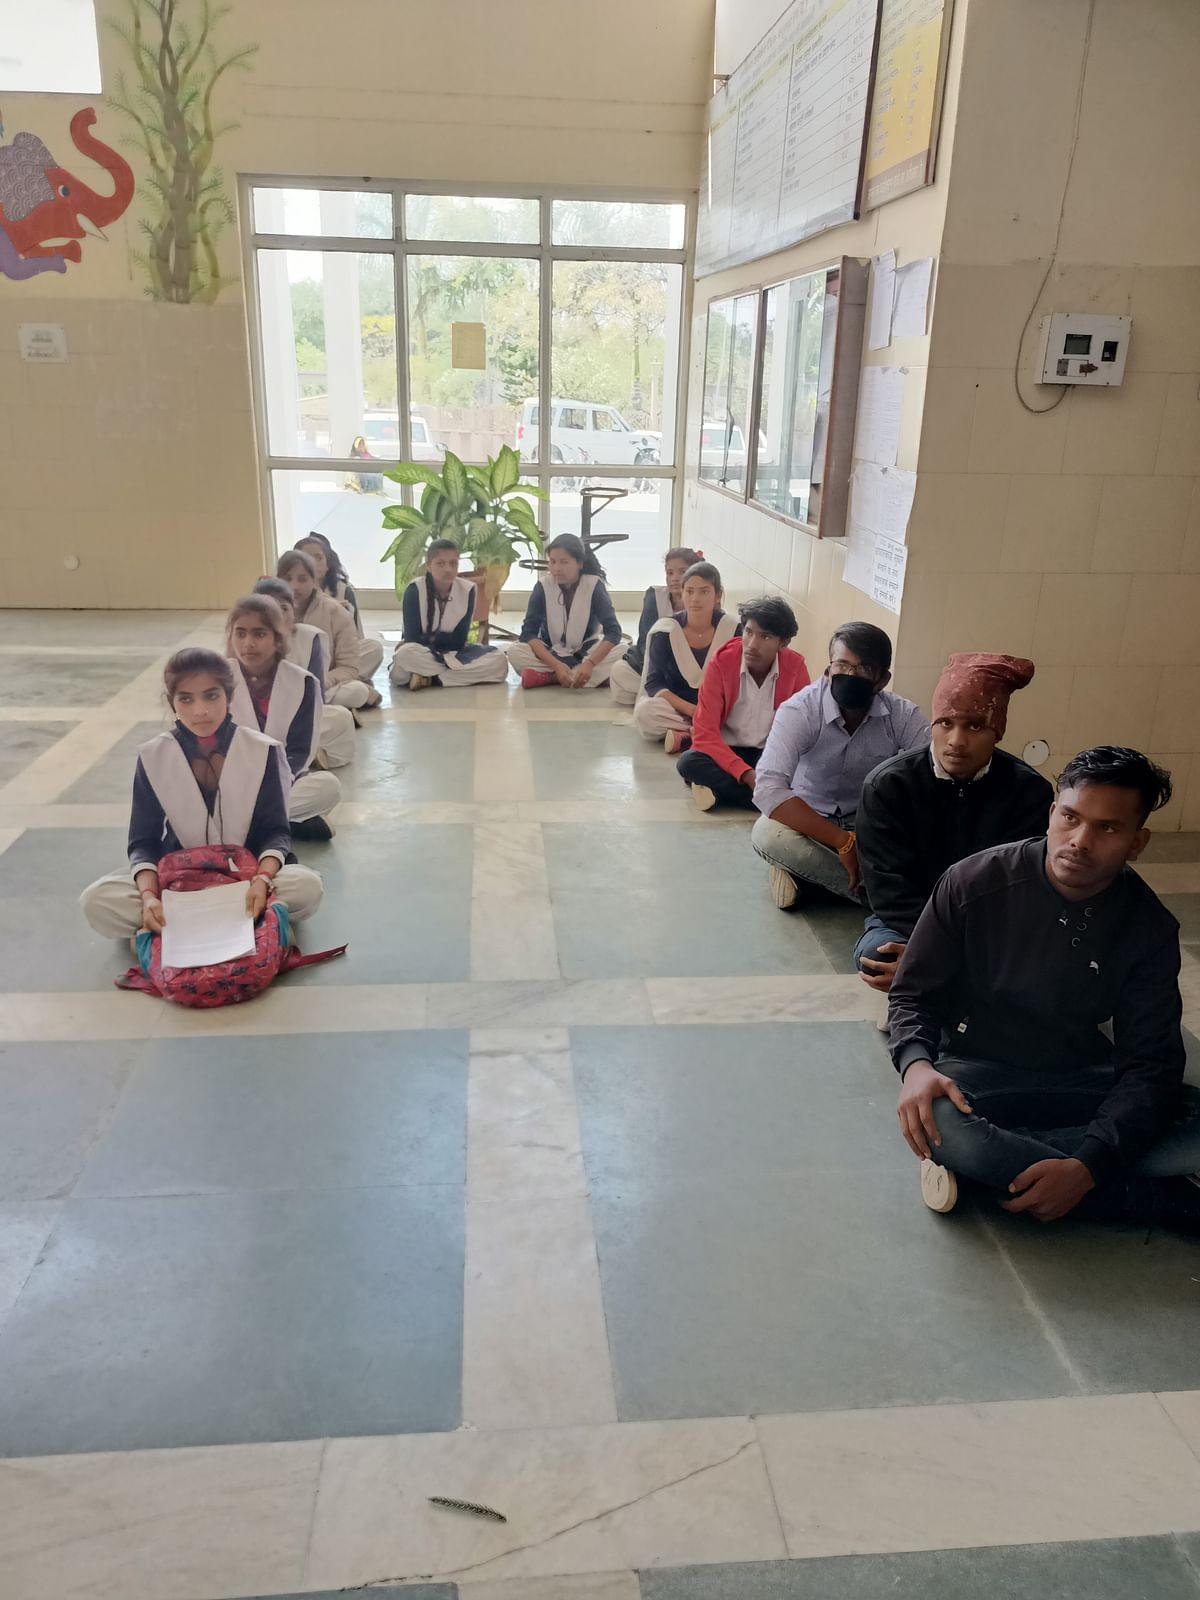 परीक्षा केंद्र बदलने को छात्र-छात्राएं पहुंचे कलेक्ट्रेट, कलेक्ट्रर को सौंपा ज्ञापन